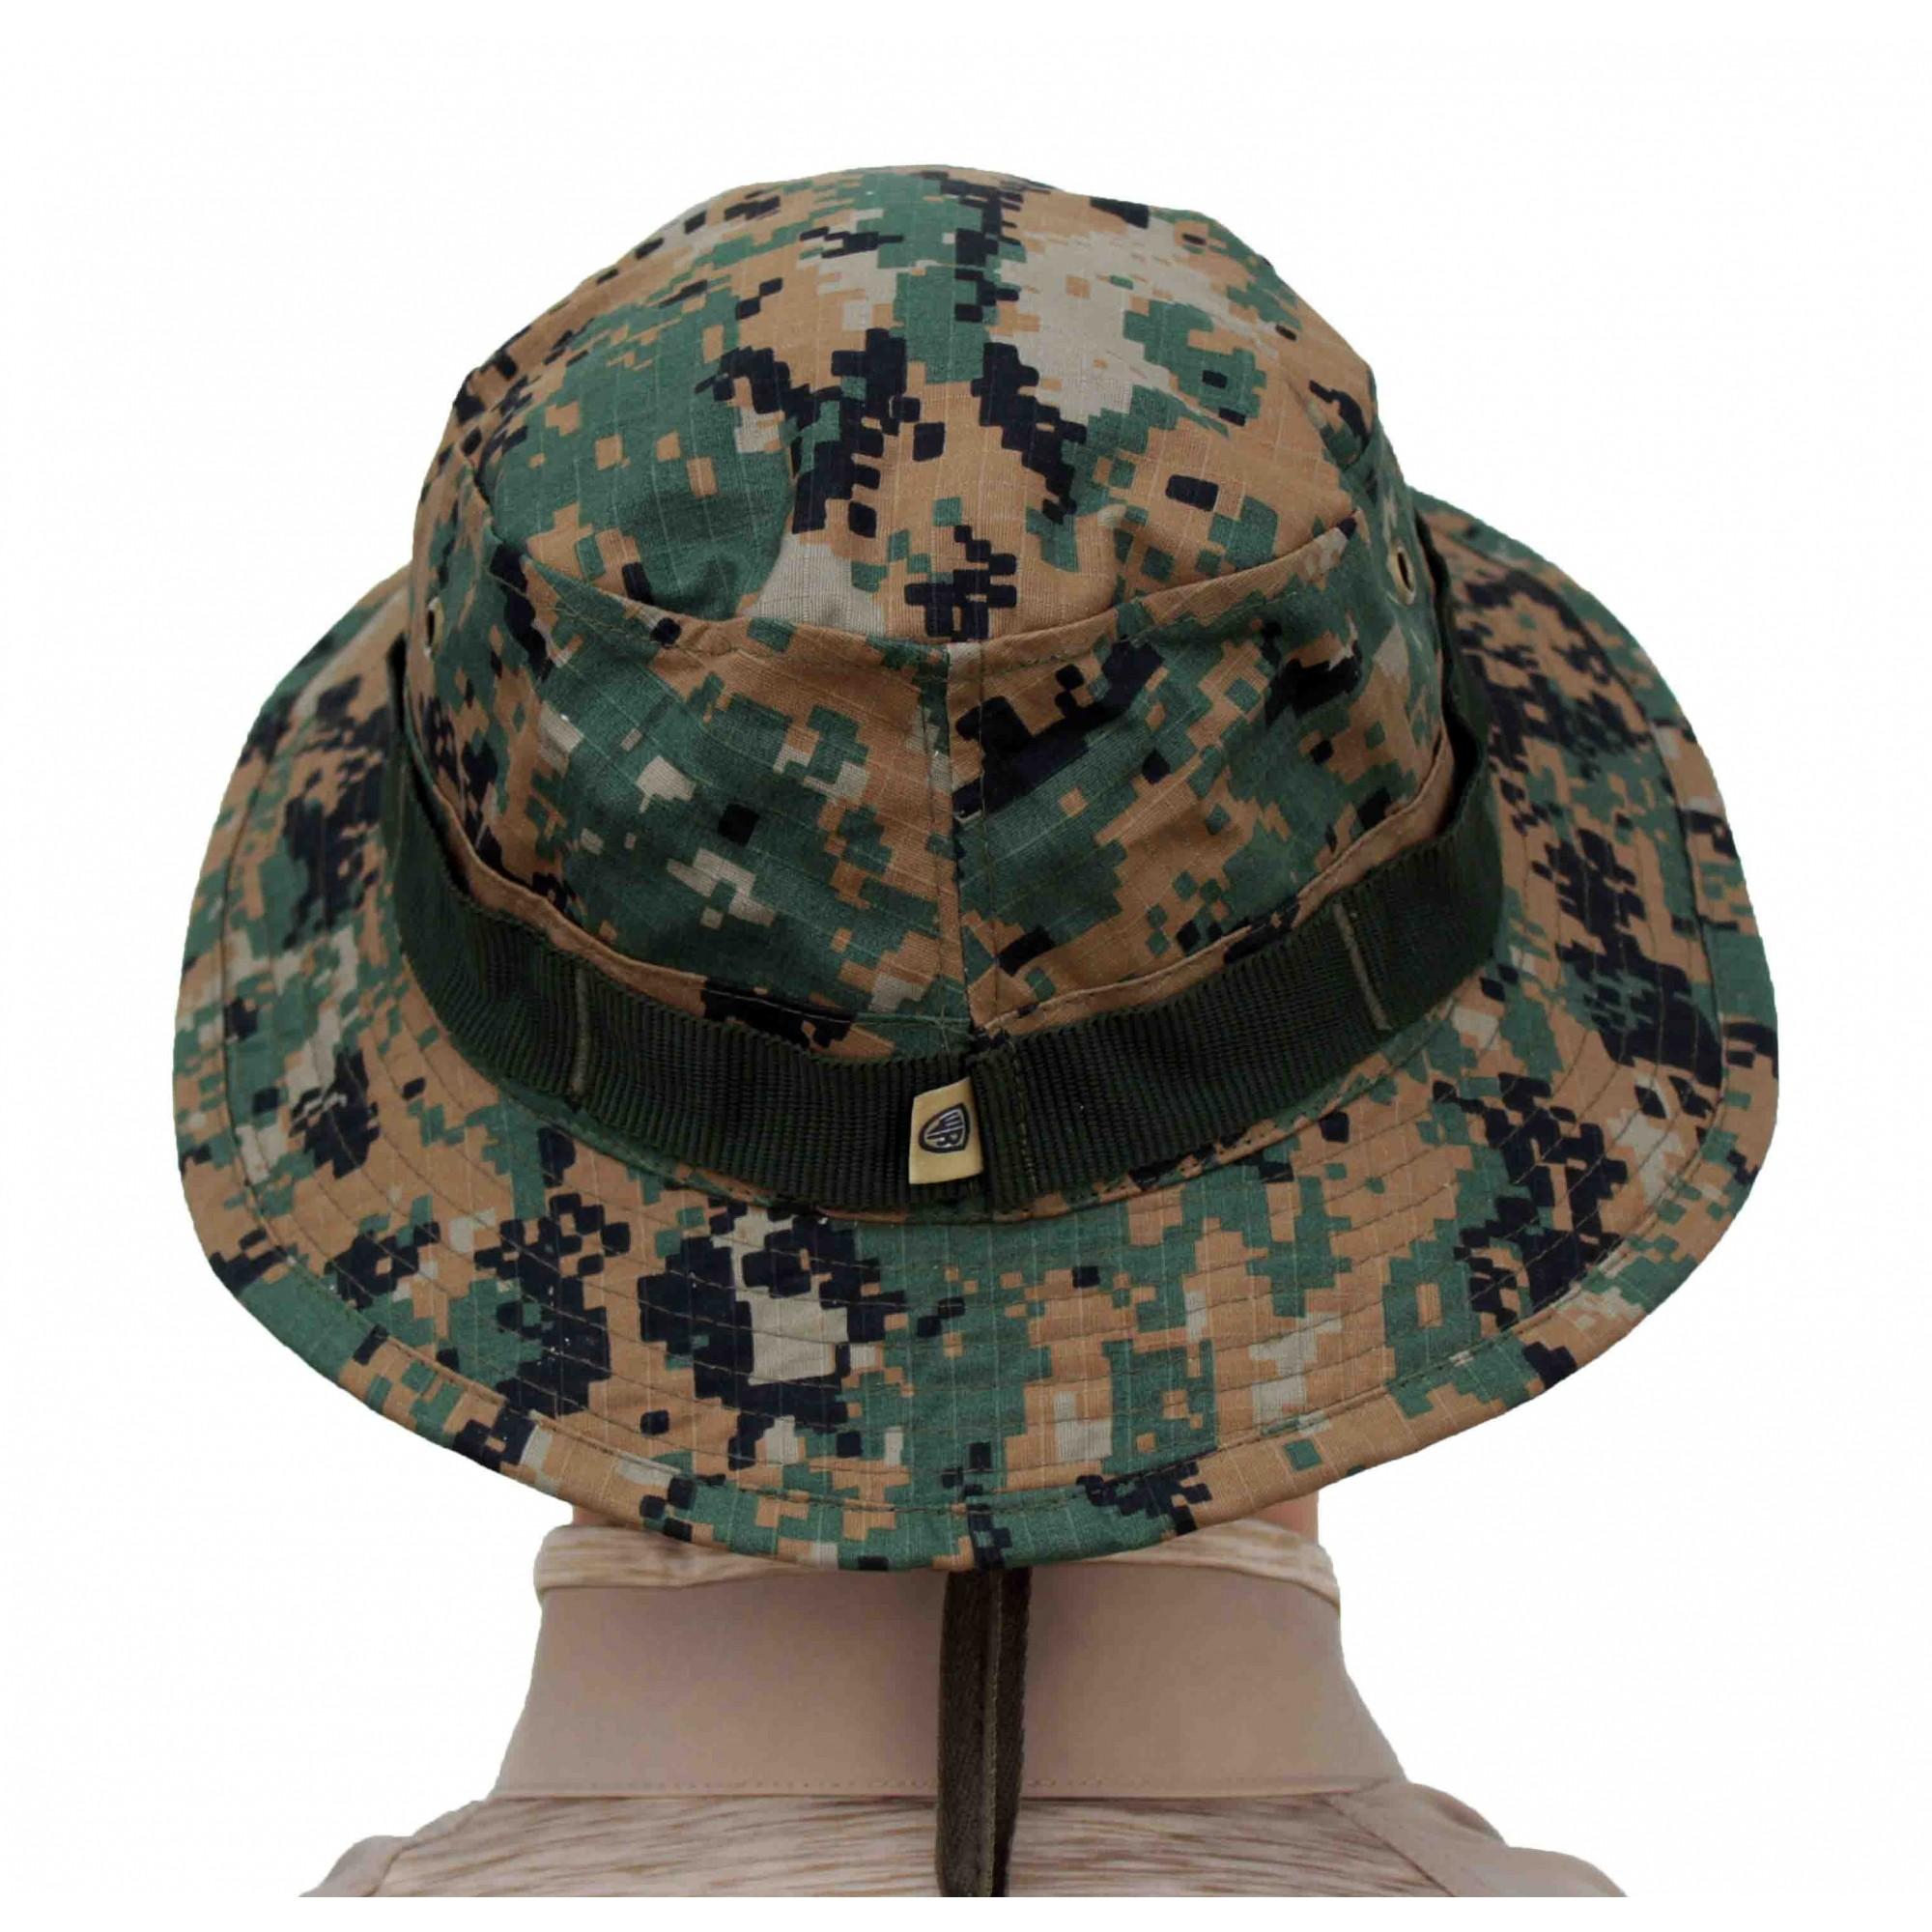 Bonnie Hat Marpat Woodland Marines